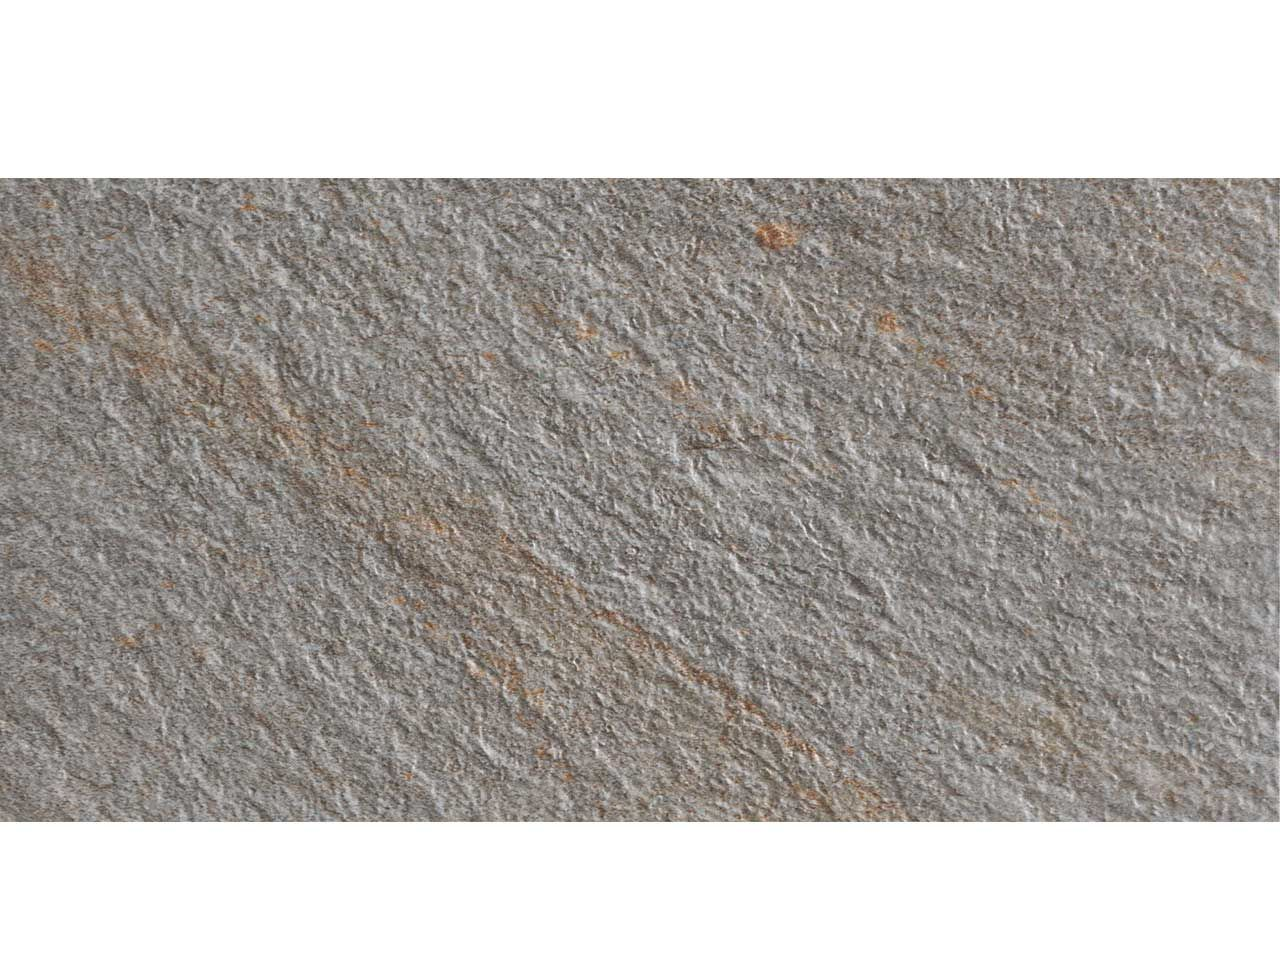 Piastrelle Da Esterno Grigio : Gres porcellanato per esterno varana grigio formato